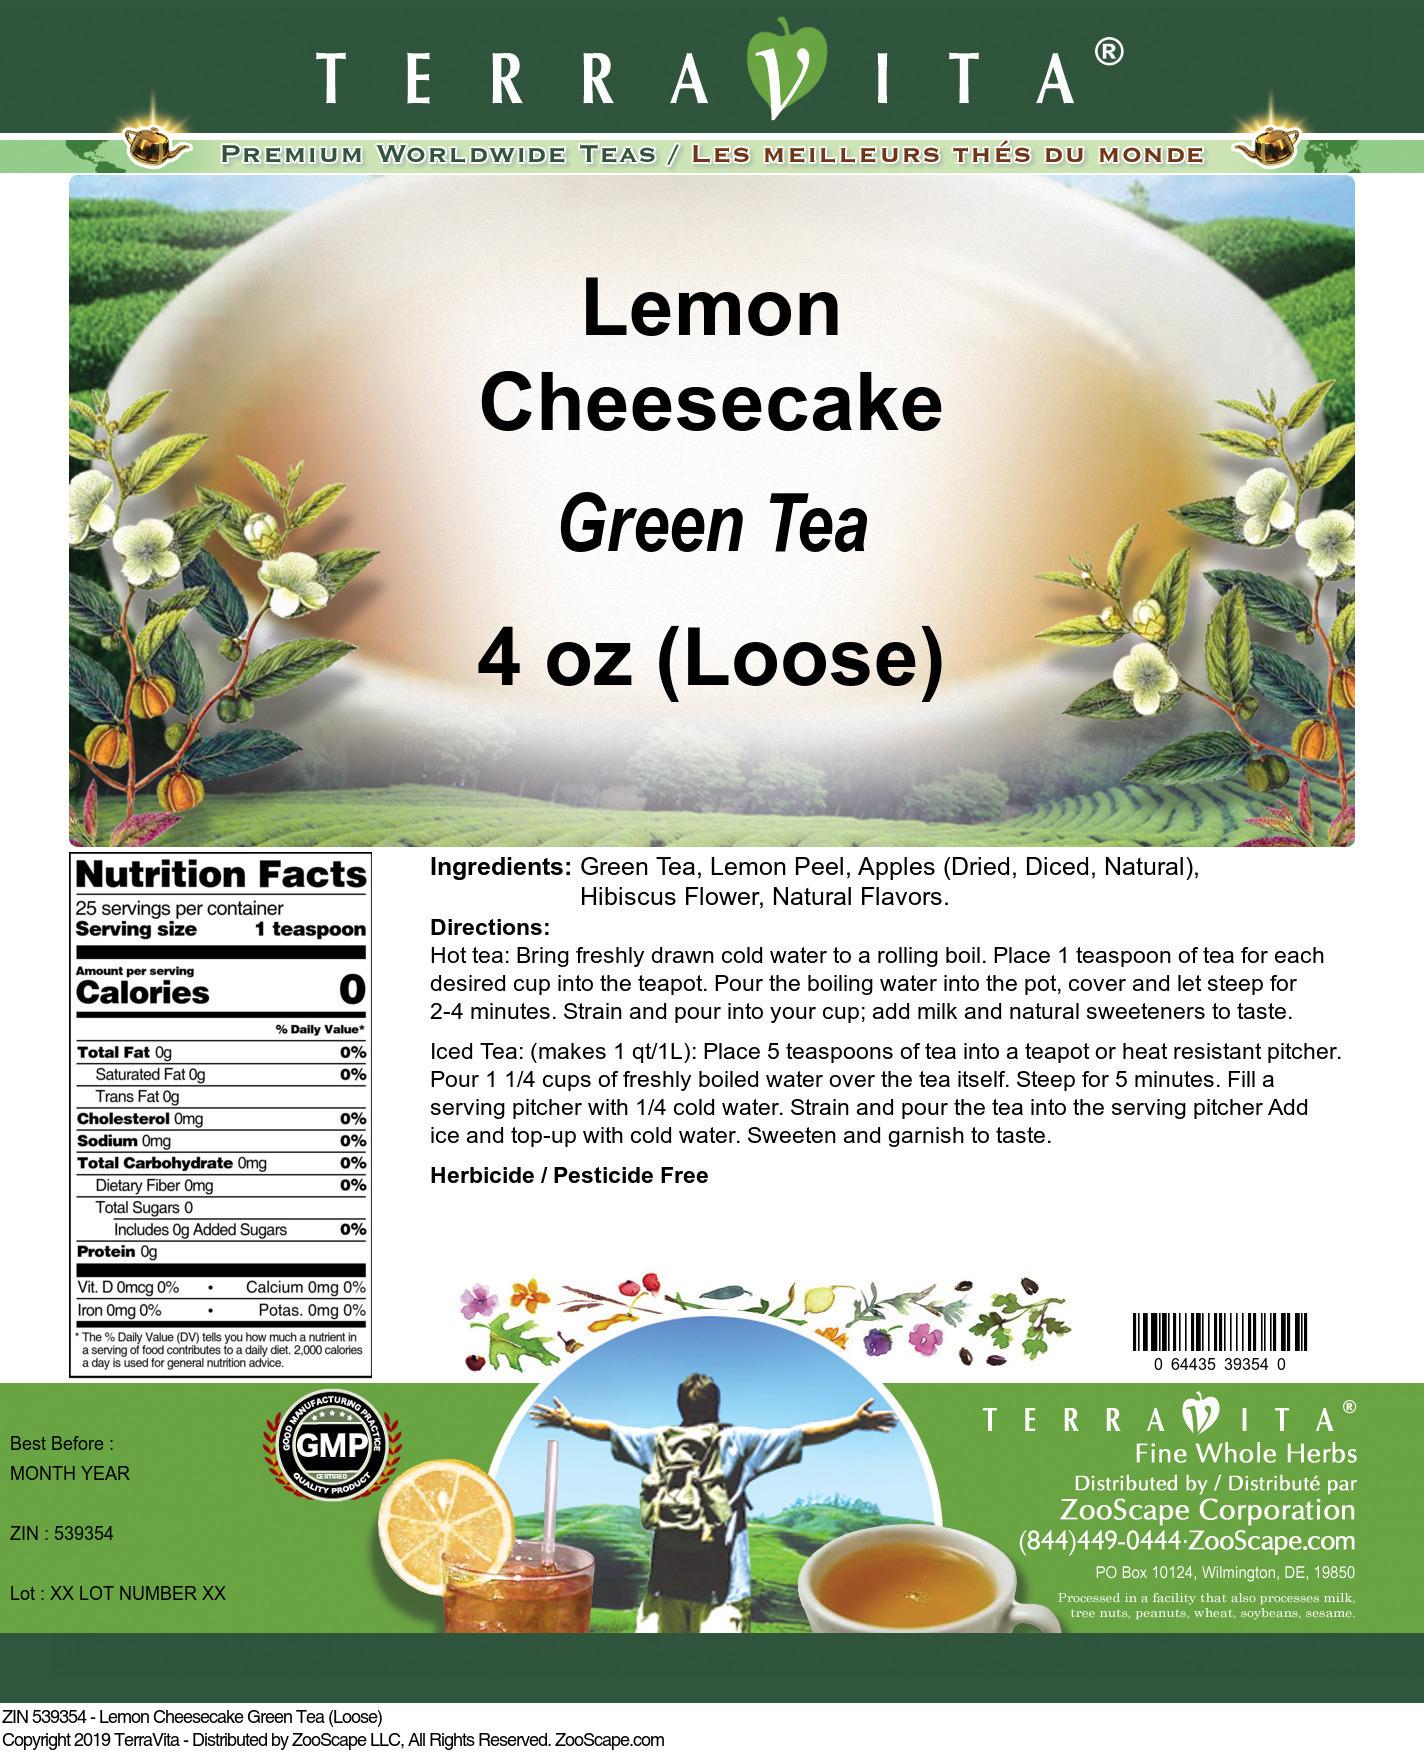 Lemon Cheesecake Green Tea